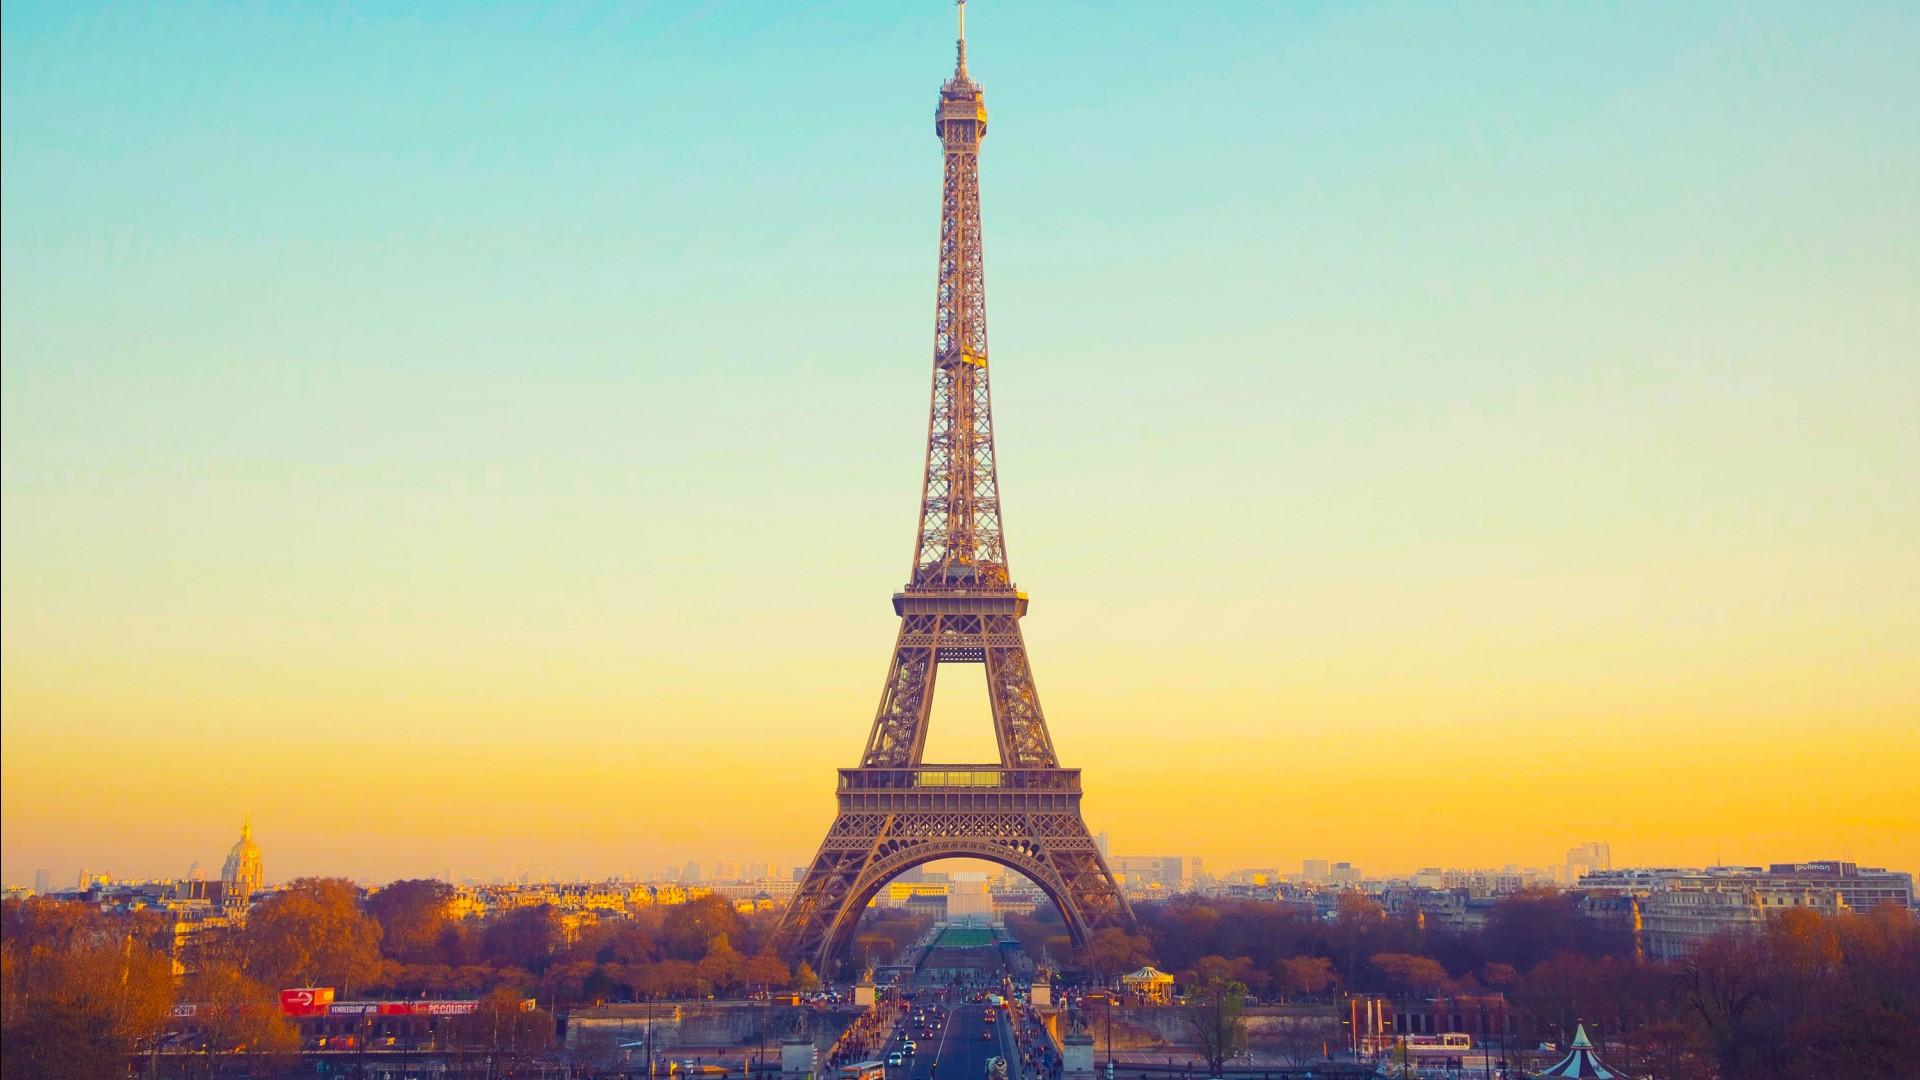 New York Iphone 6 Wallpaper Eiffel Tower Paris Wallpapers Hd Wallpapers Id 25752